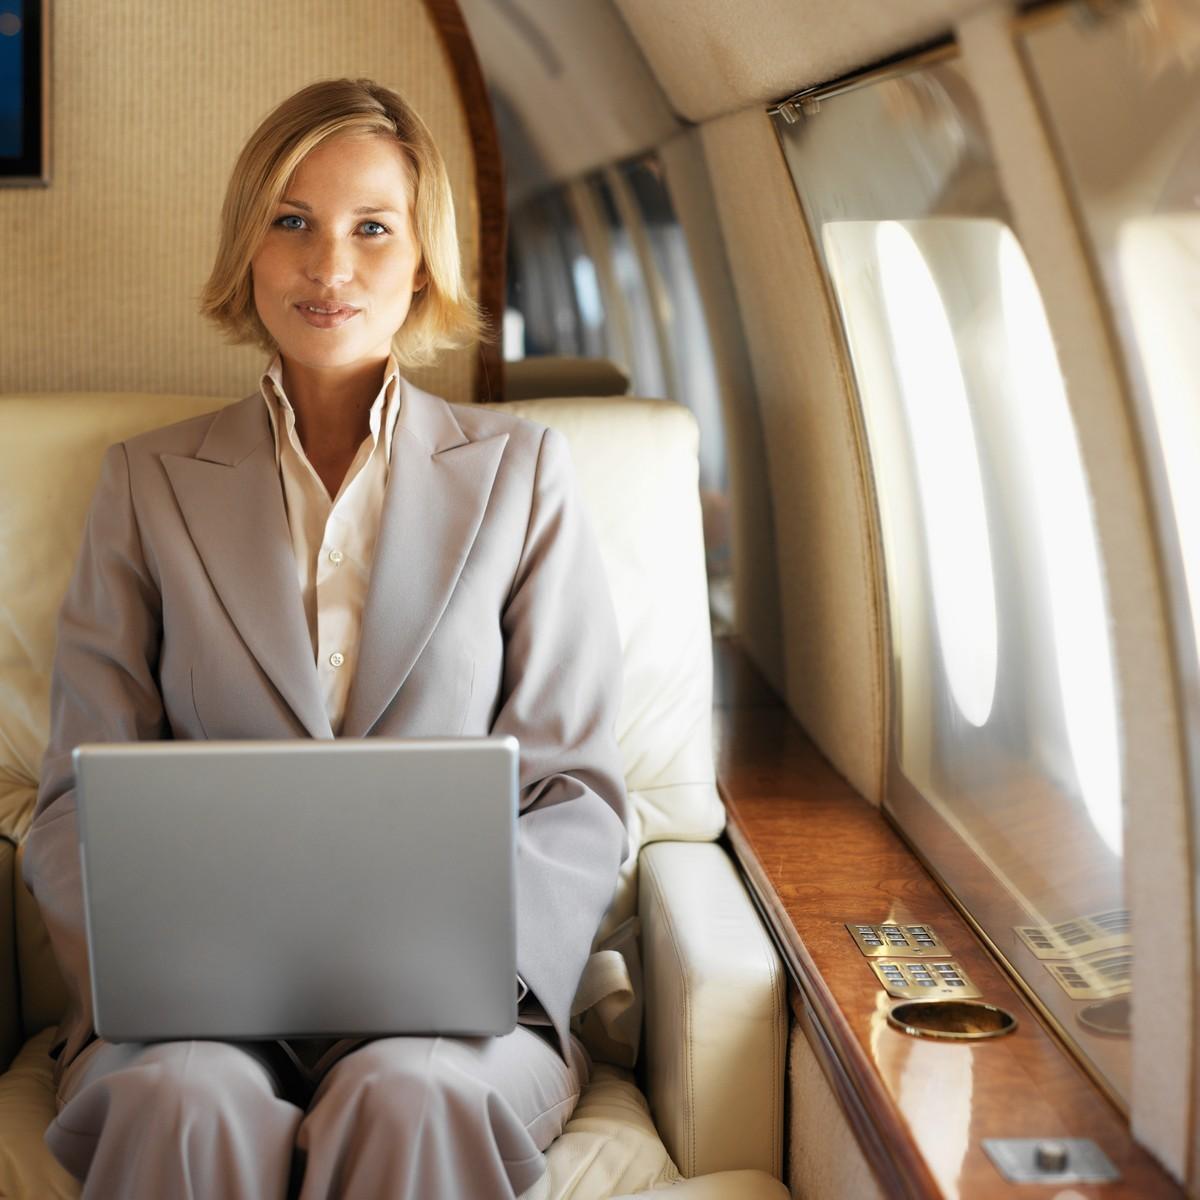 Private Jet Charter Philadelphia to Fort Lauderdale